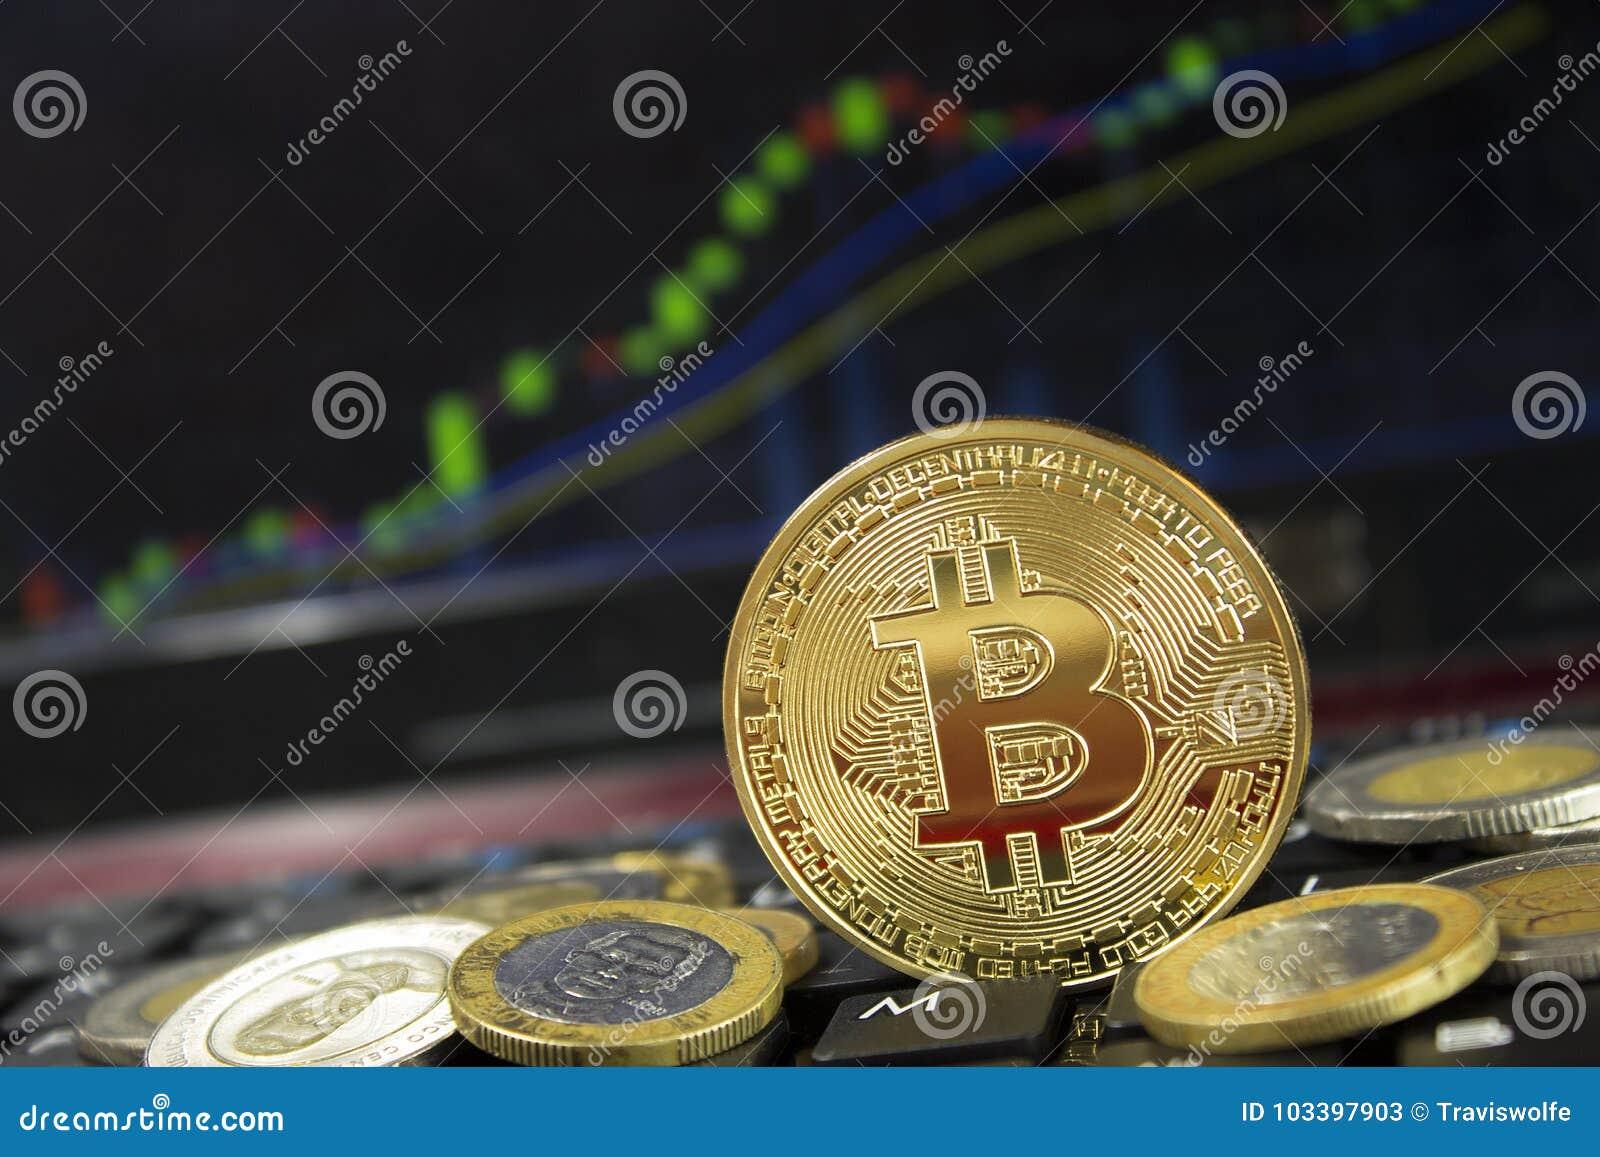 bitcoin mining income